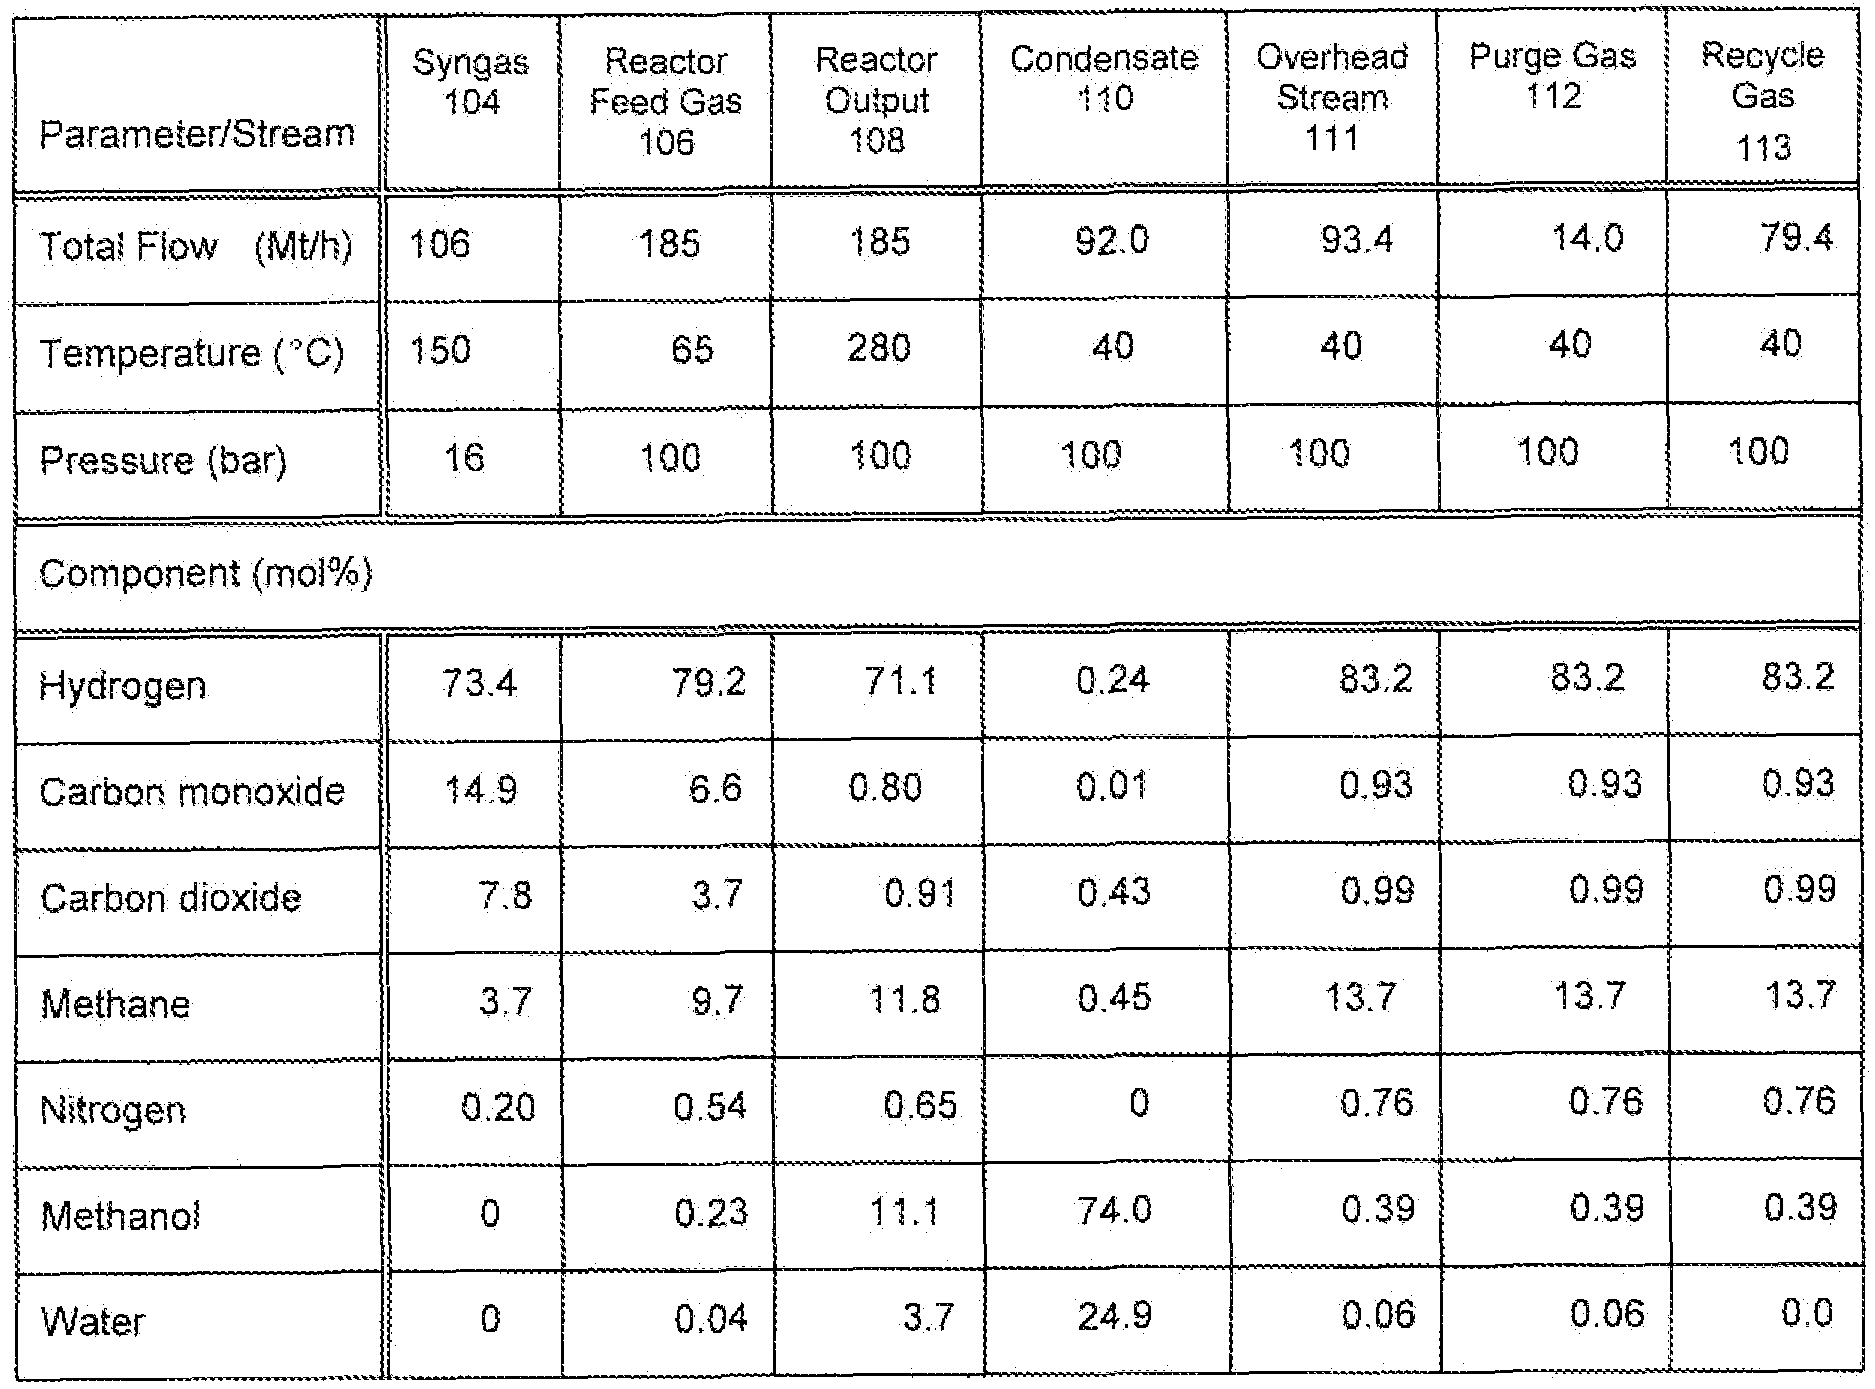 Gallon conversion chart liter images gallon conversion chart liter liquid conversion chart gallon nvjuhfo Gallery